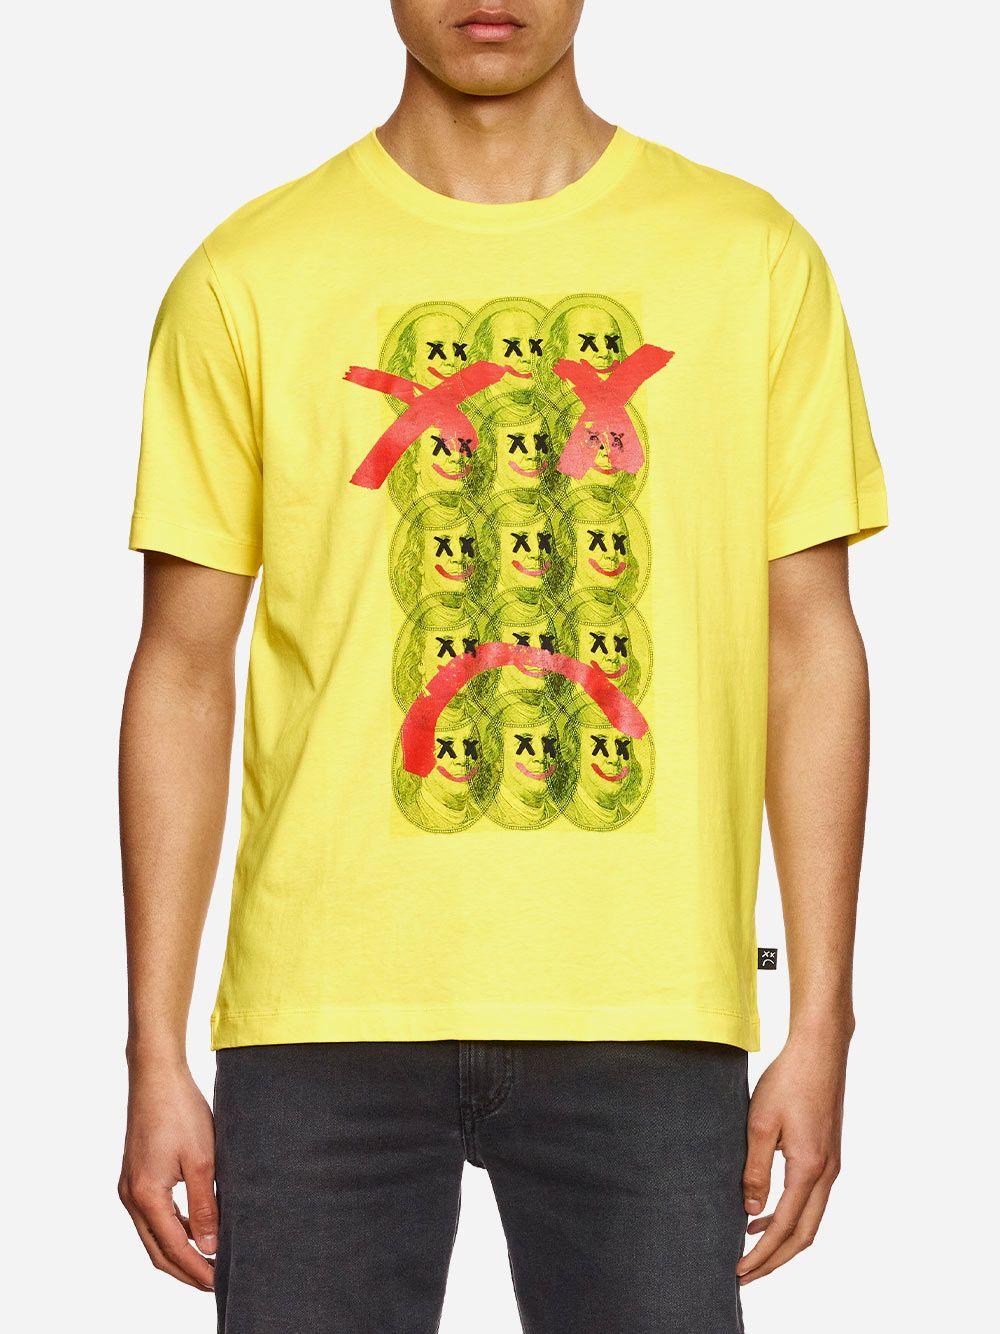 T-Shirt Amarela Estampada | AMBITIOUS